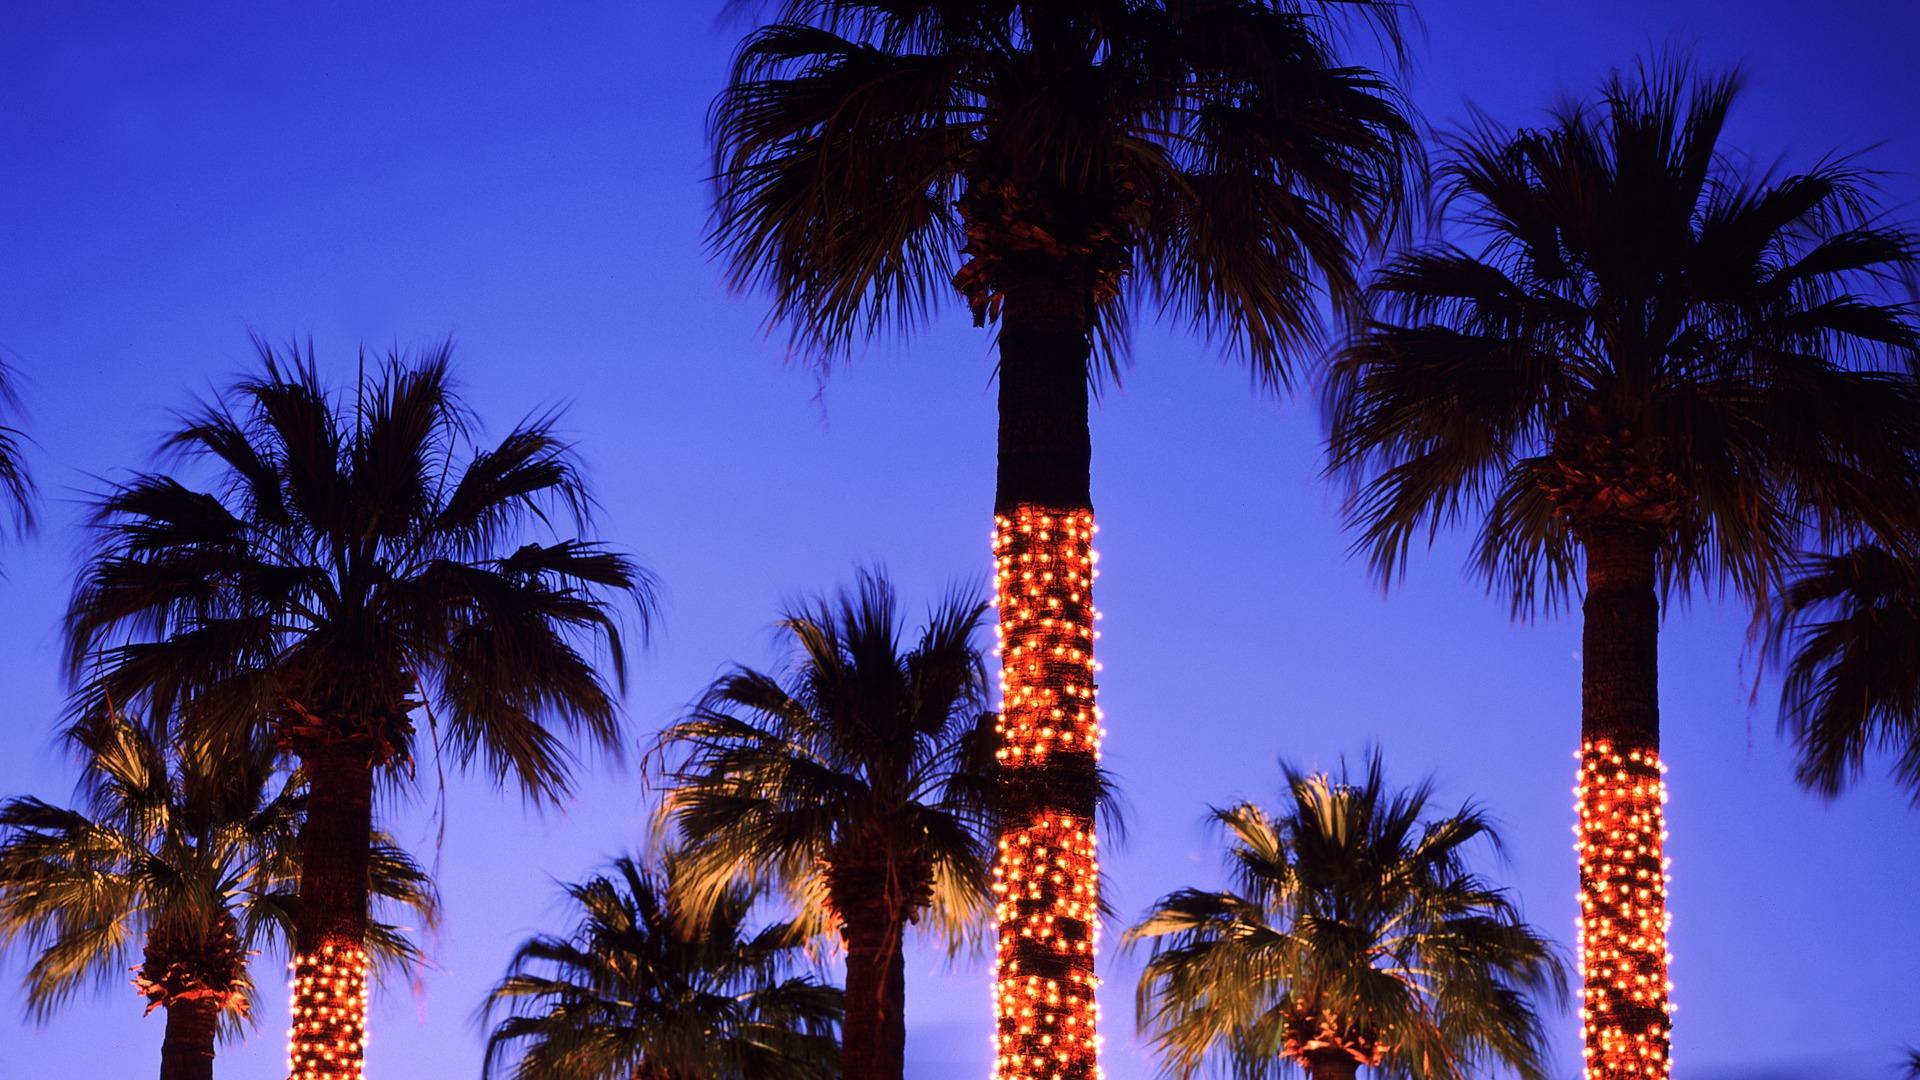 put up christmas lights palm tree wallpaper preview | 10wallpaper